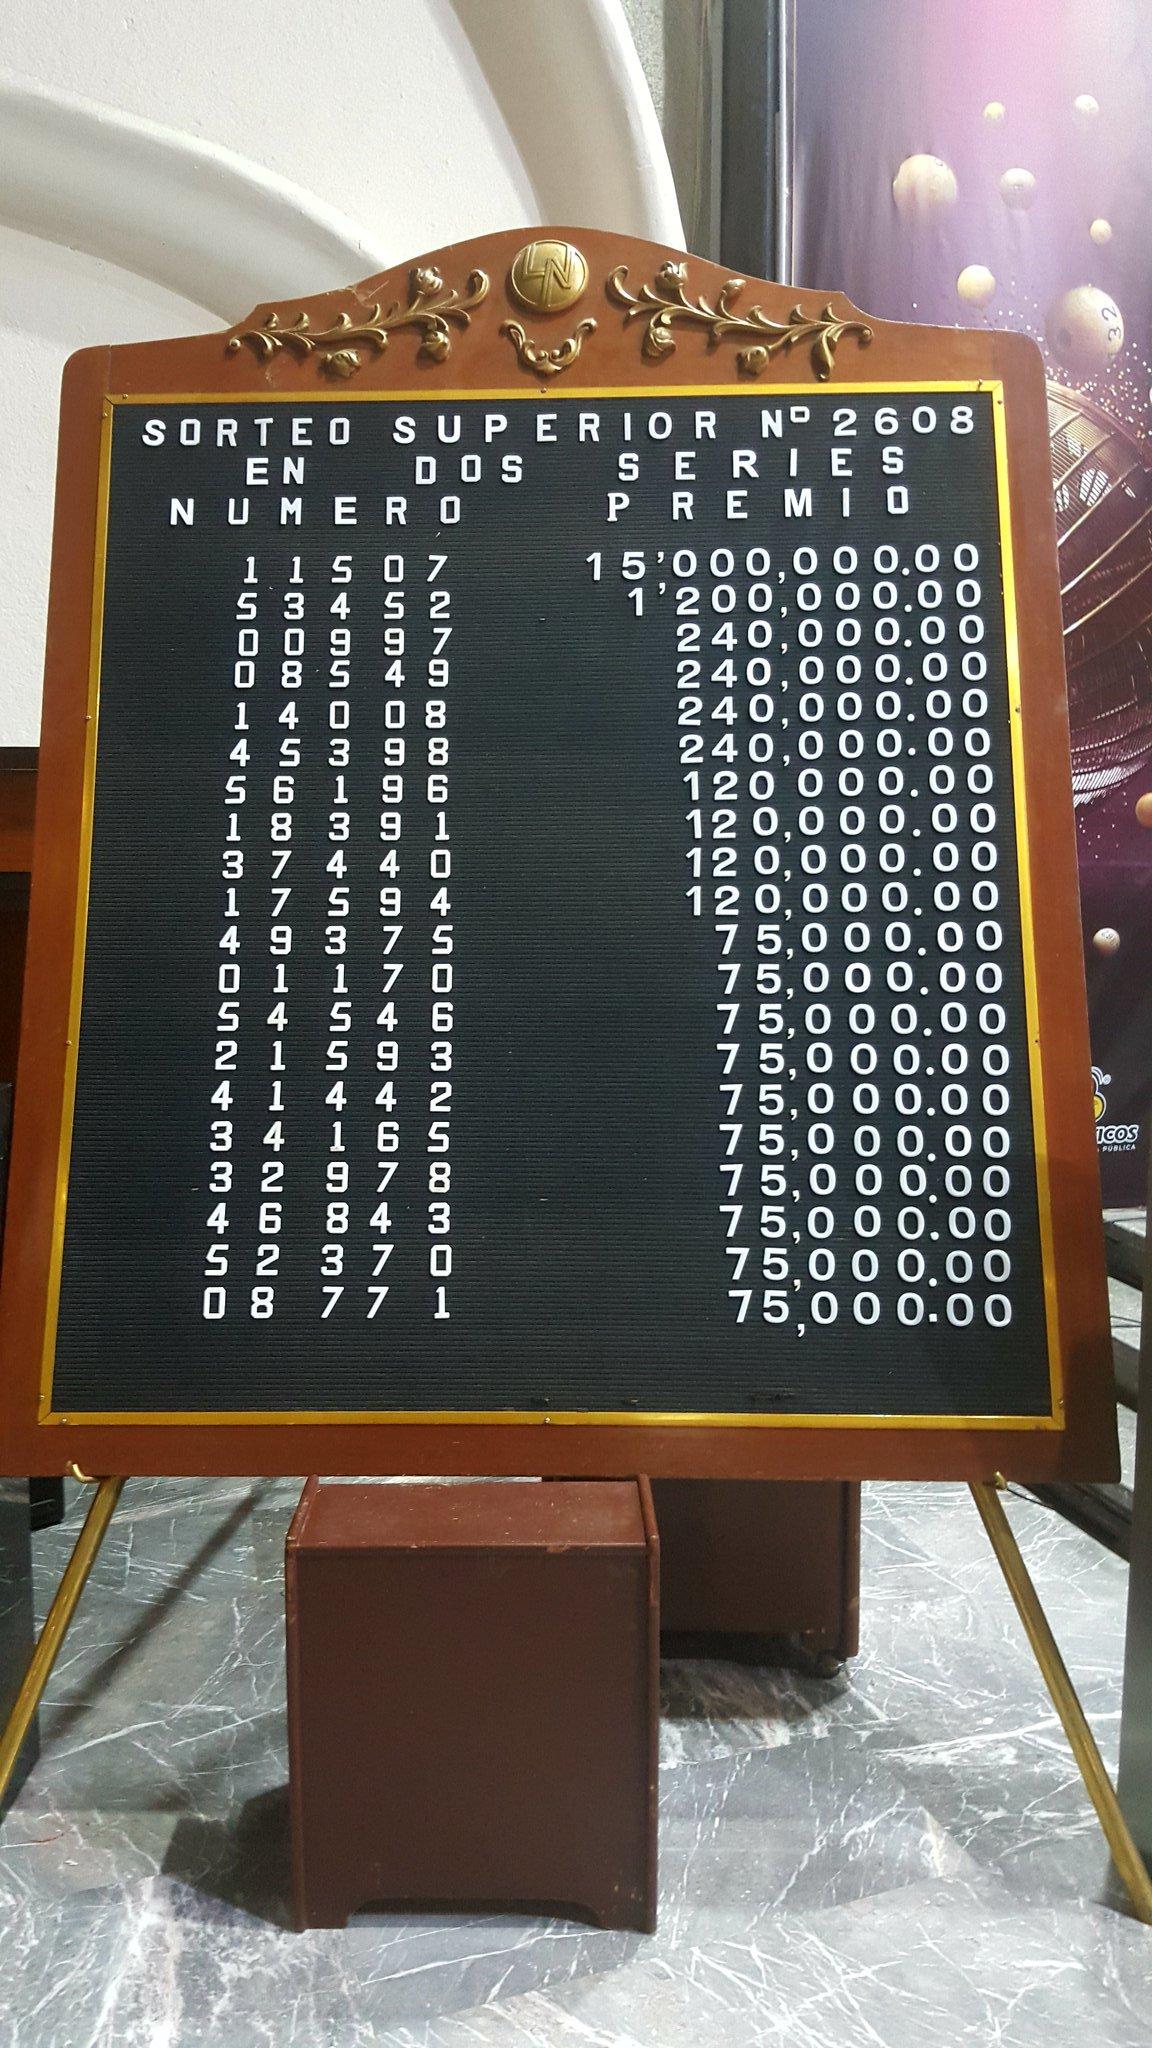 Sorteo Superior 2608